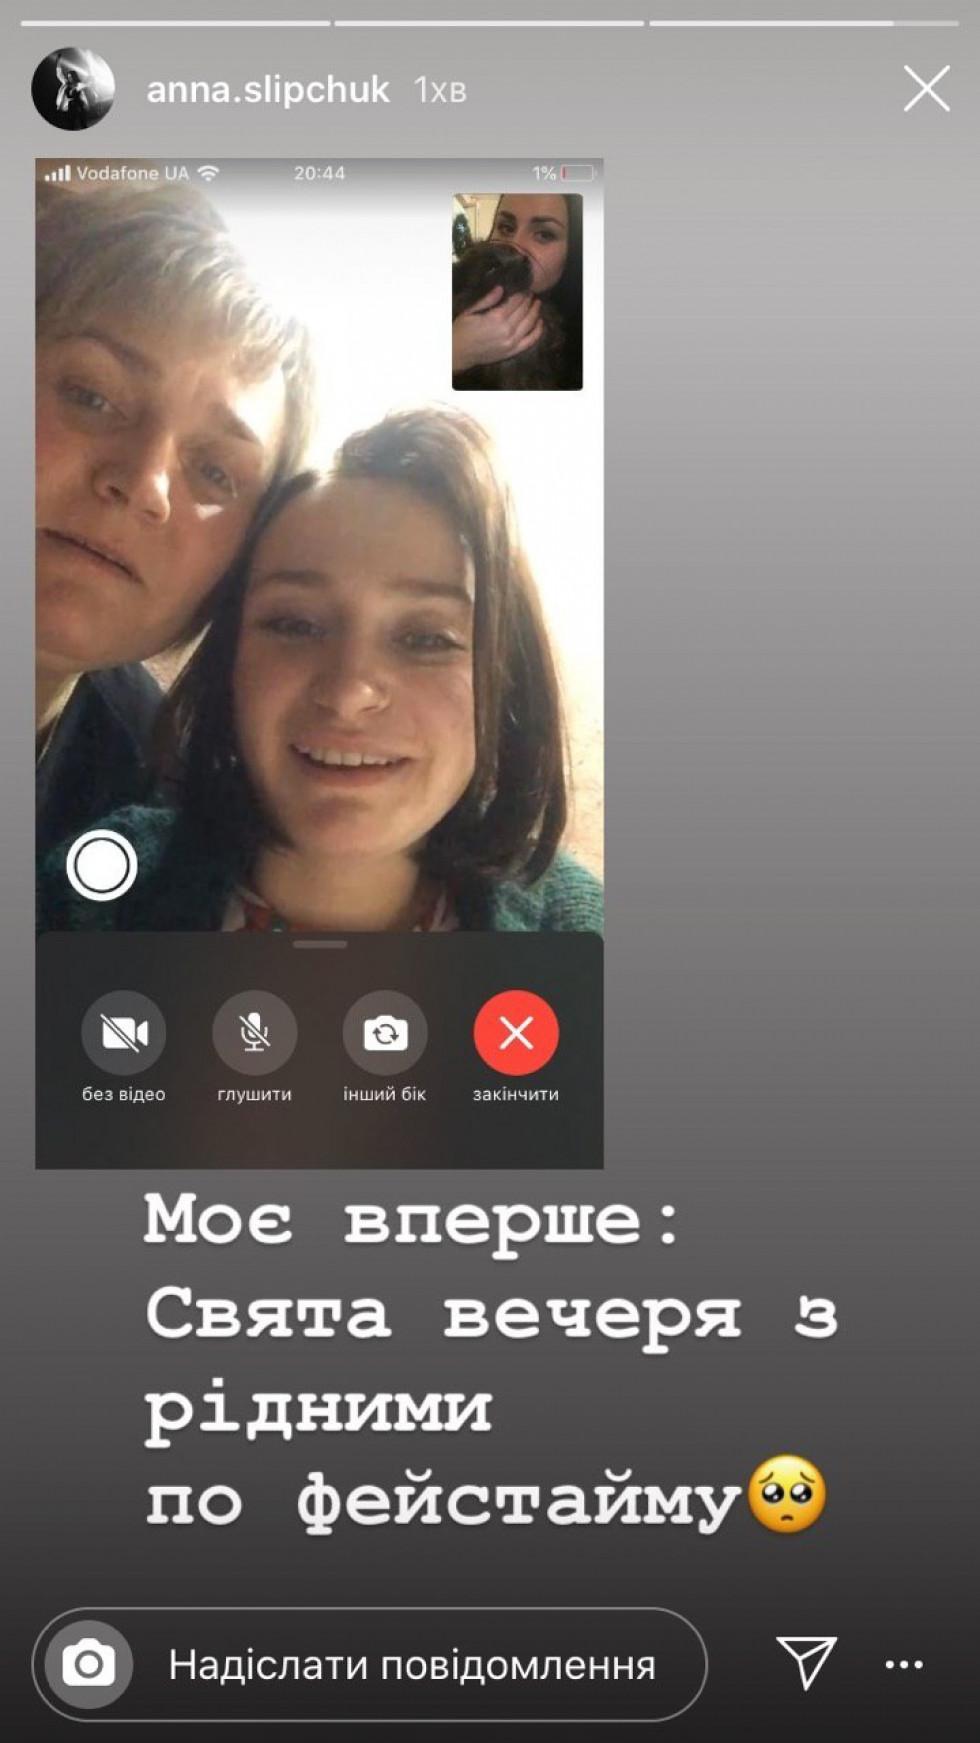 Анна Сліпчук